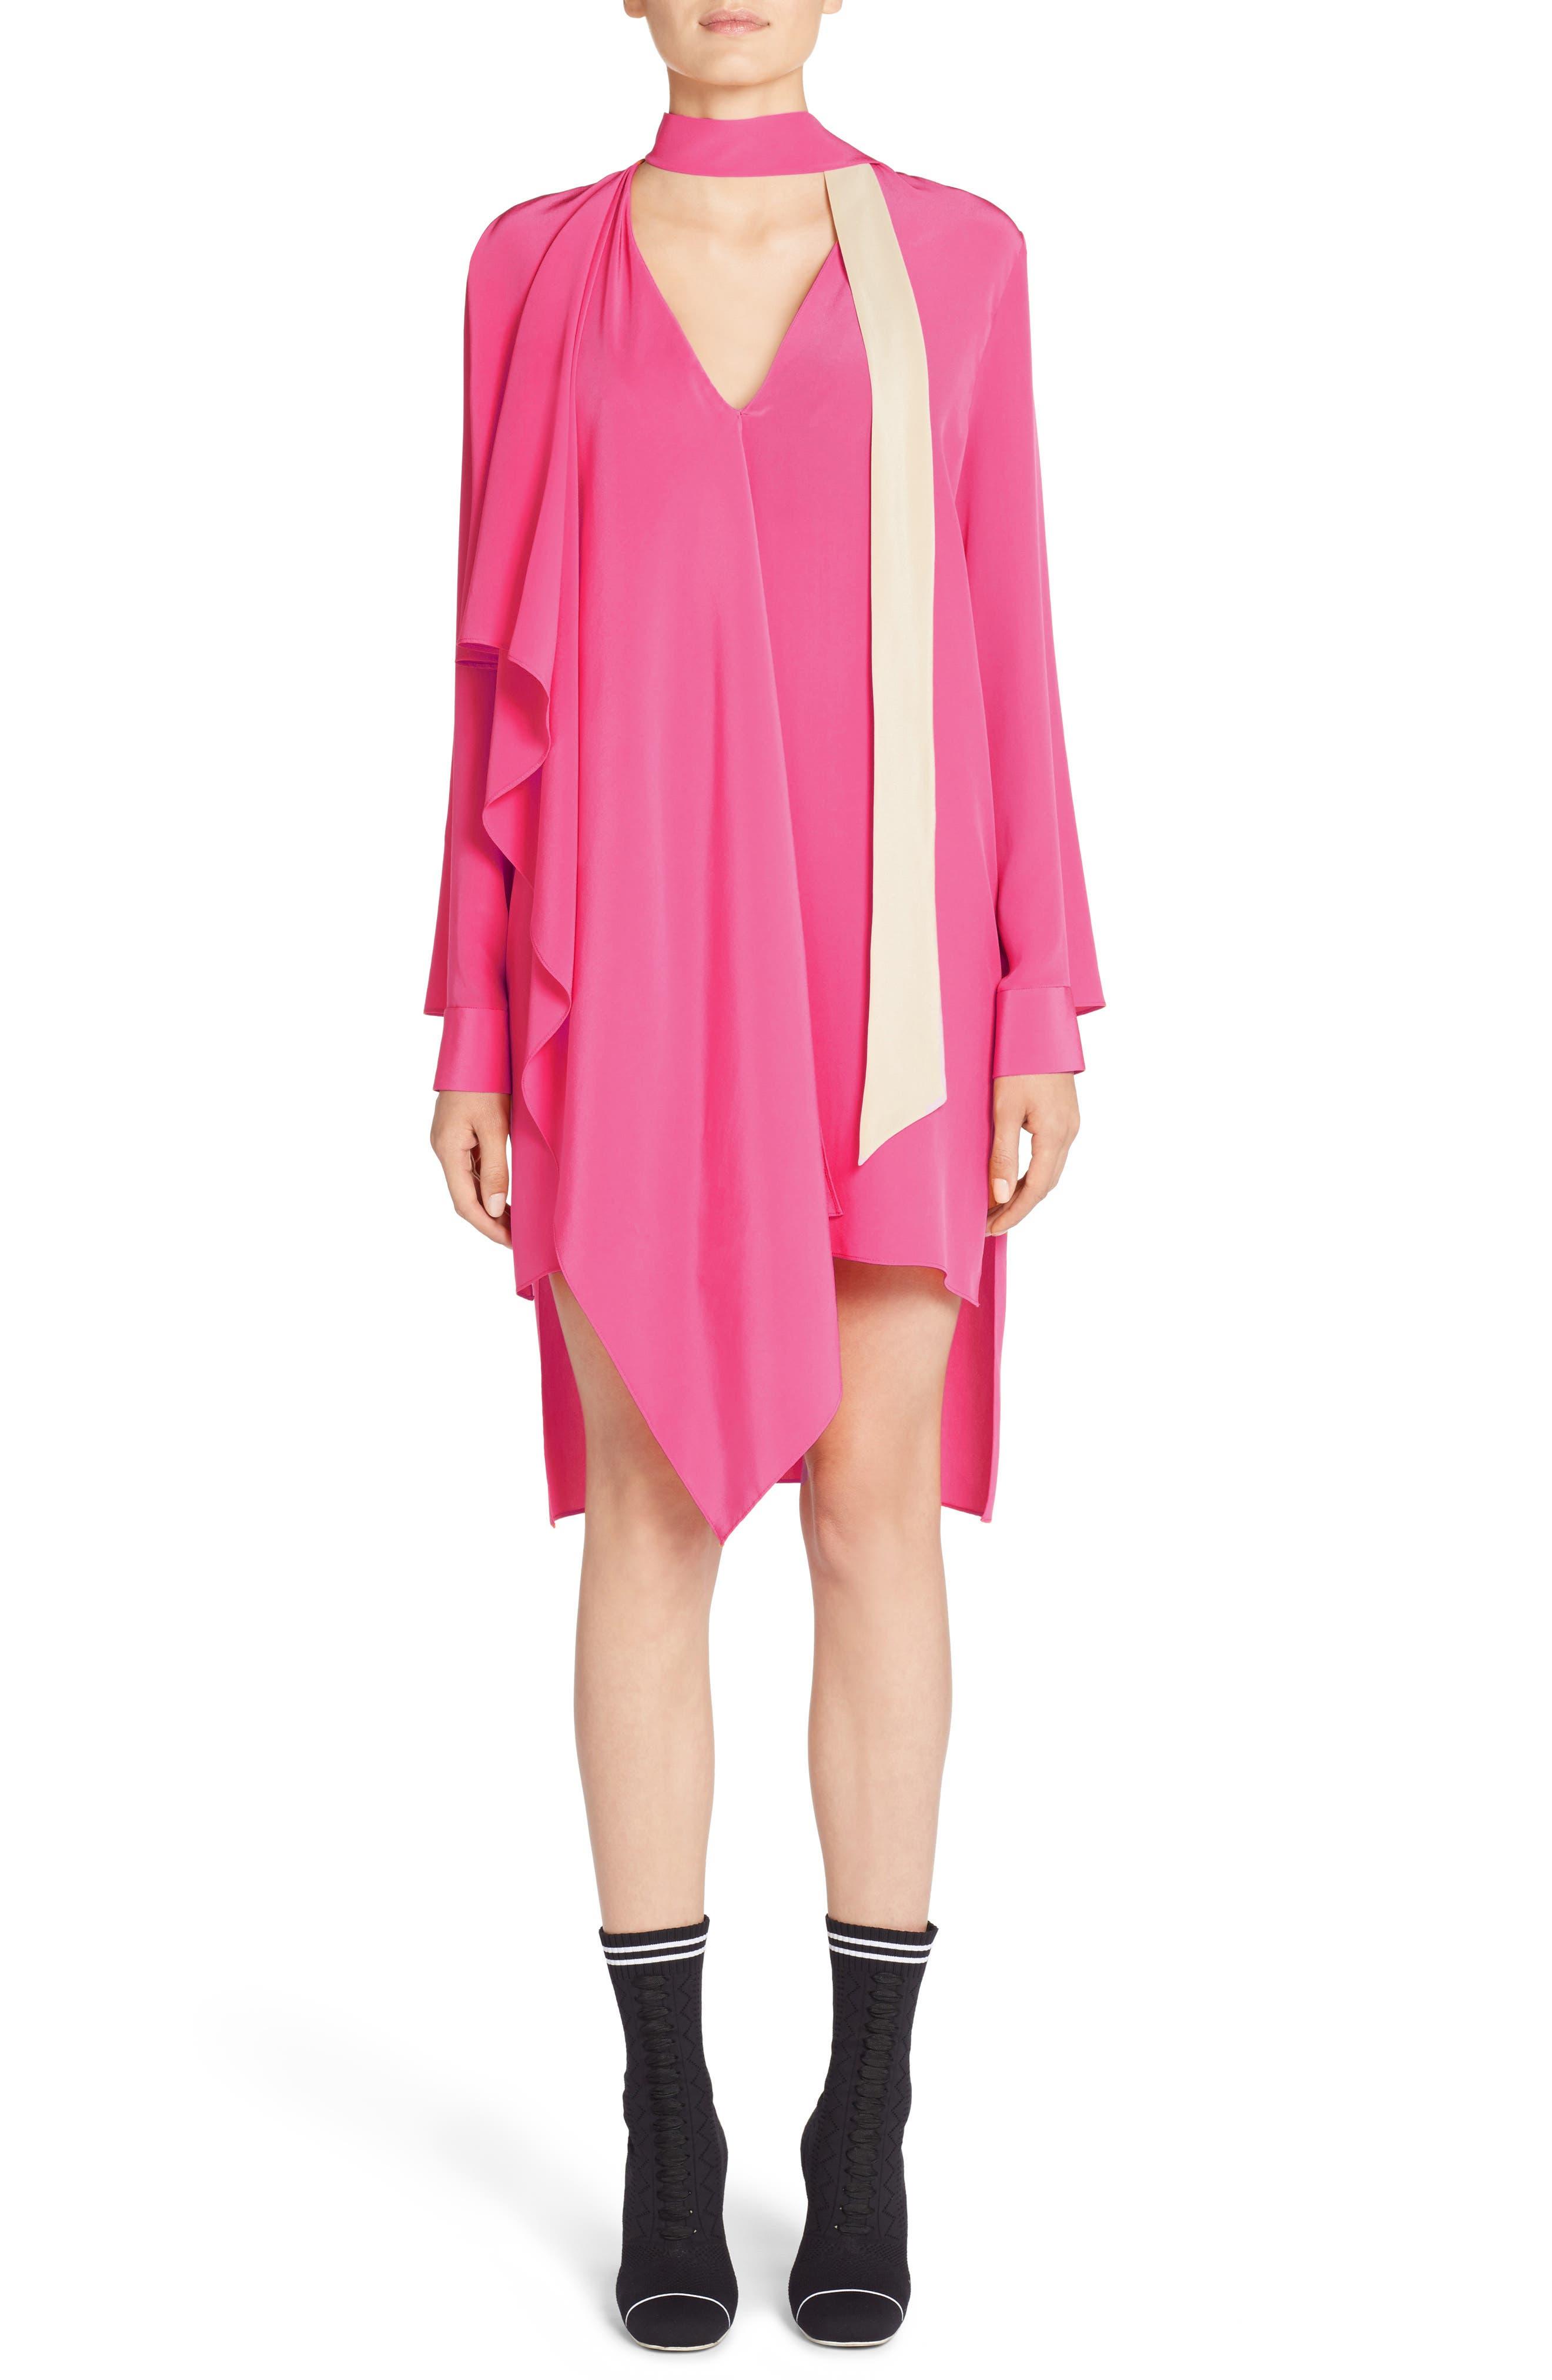 Alternate Image 1 Selected - Fendi Drape Silk Crêpe de Chine Dress